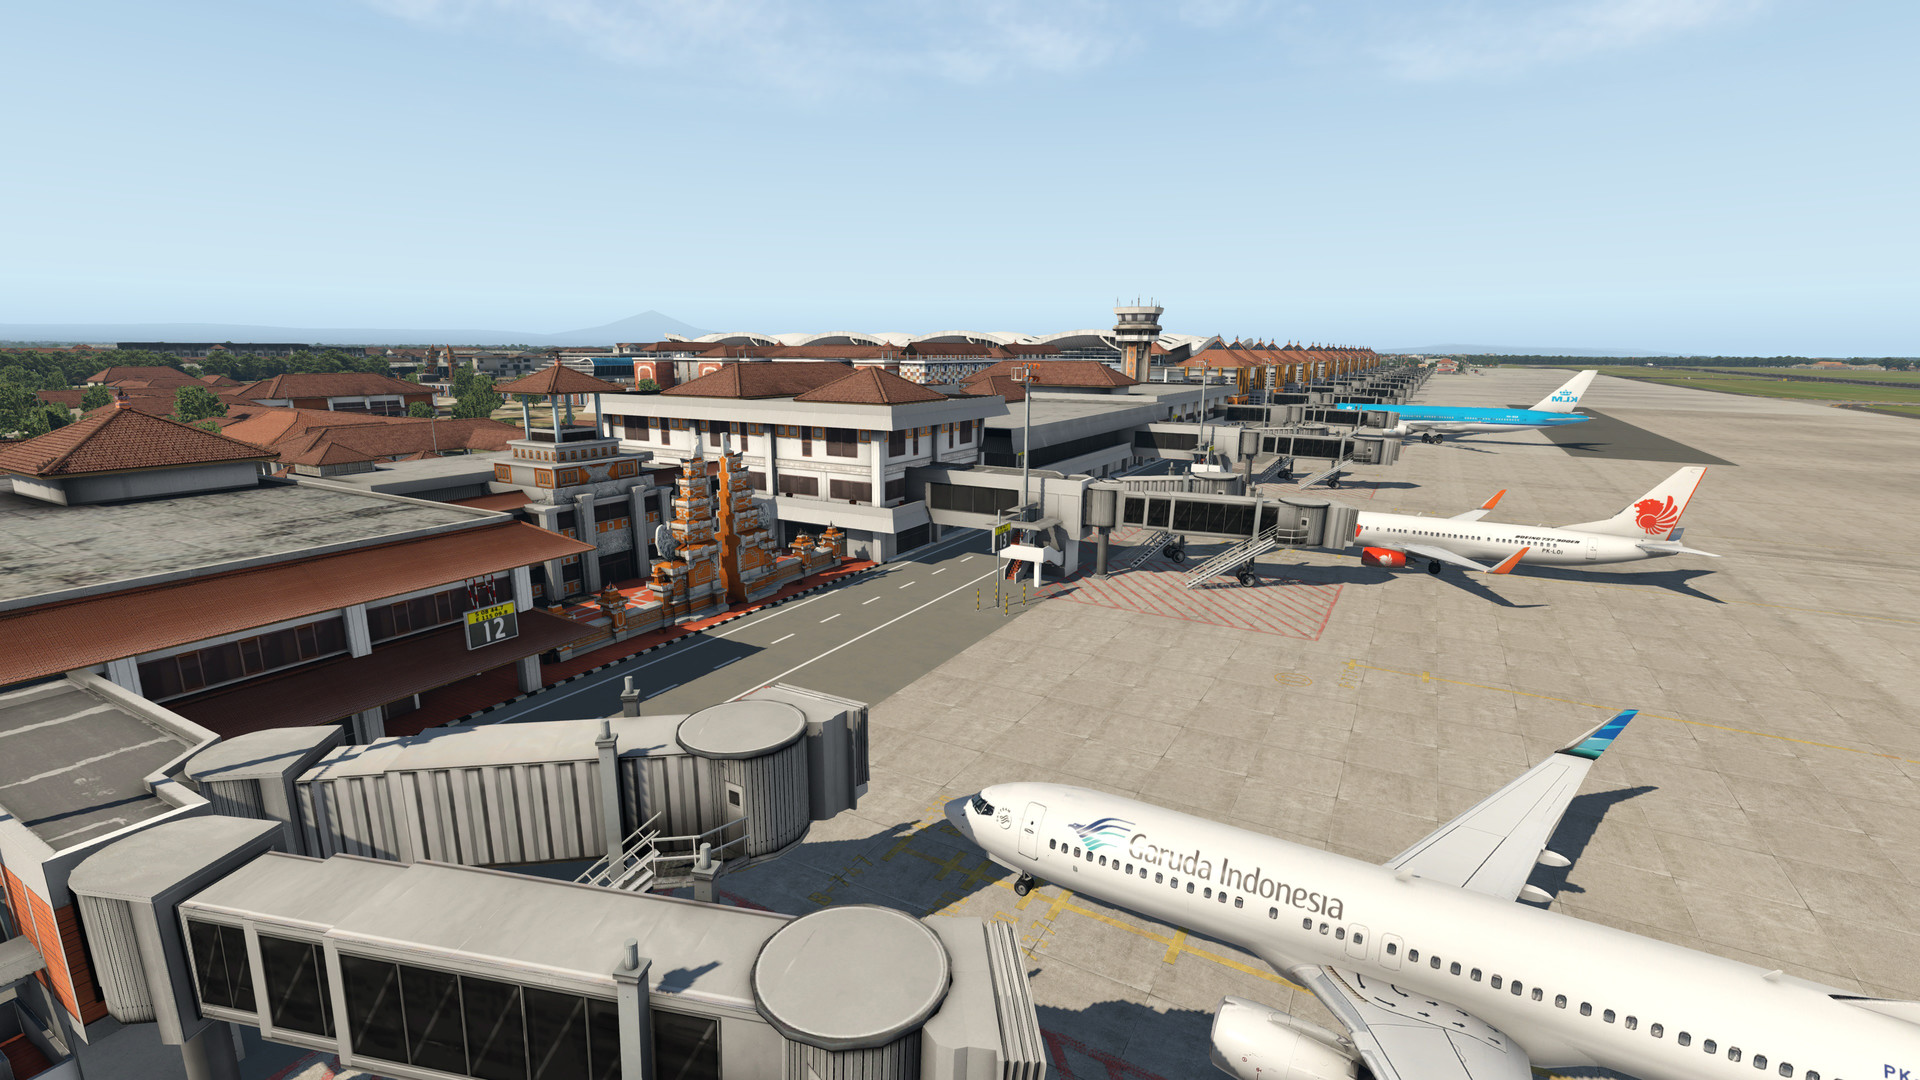 X-Plane 11 - Add-on: Aerosoft - Airport Bali